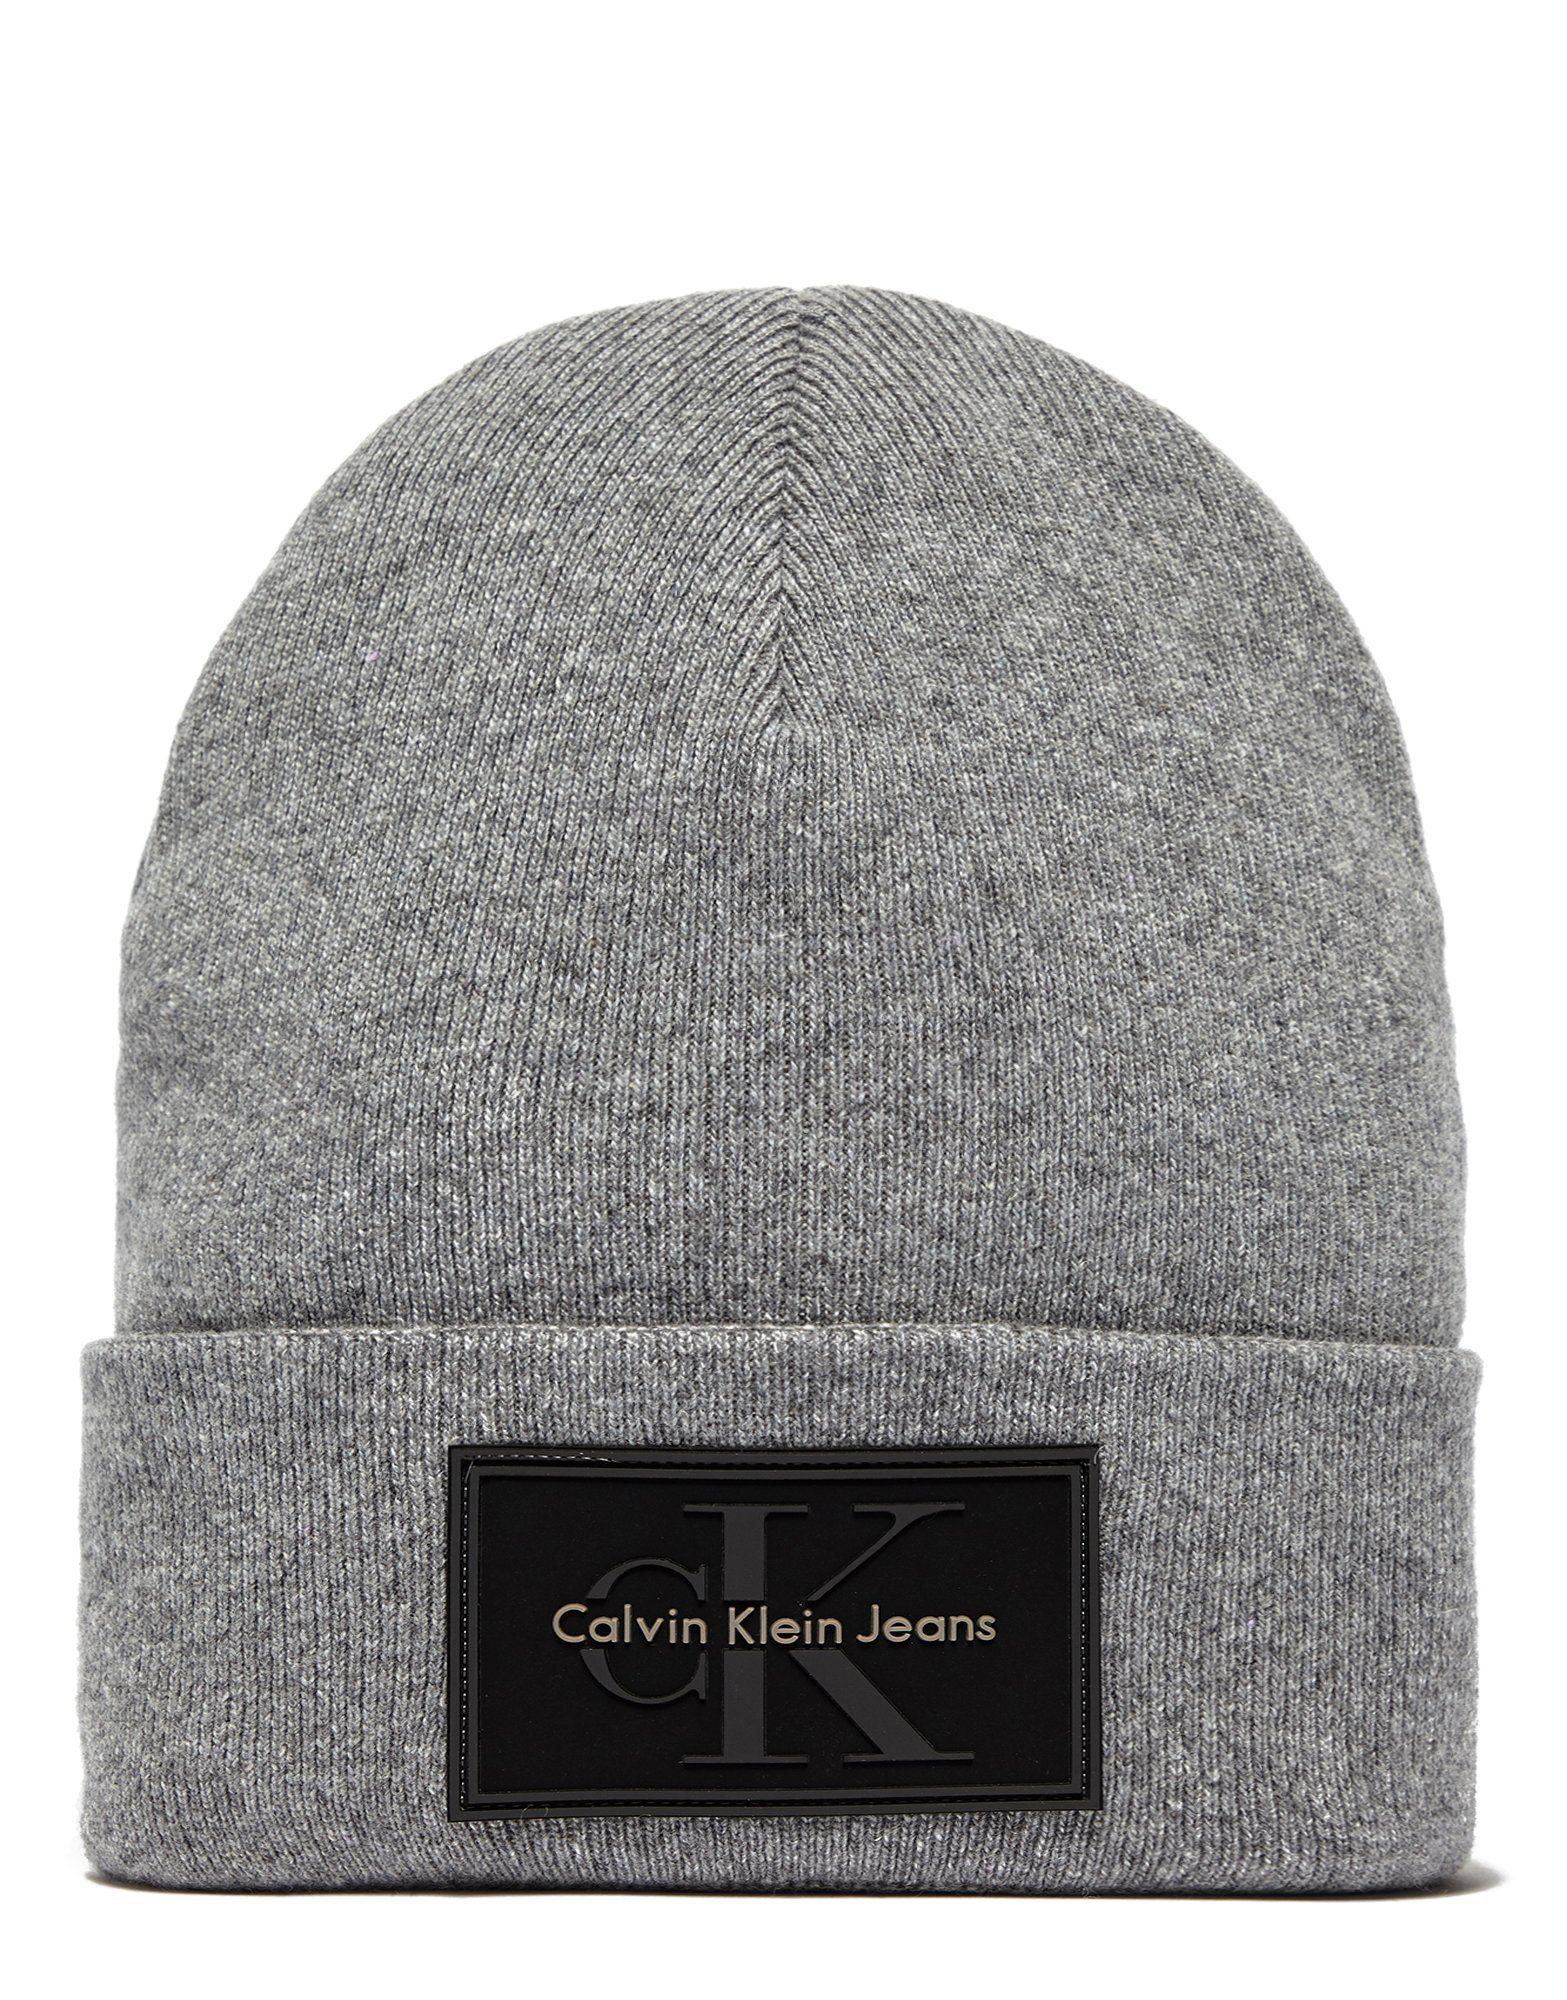 Calvin Klein Reissue Knitted Beanie ... 006cfbc2ba6